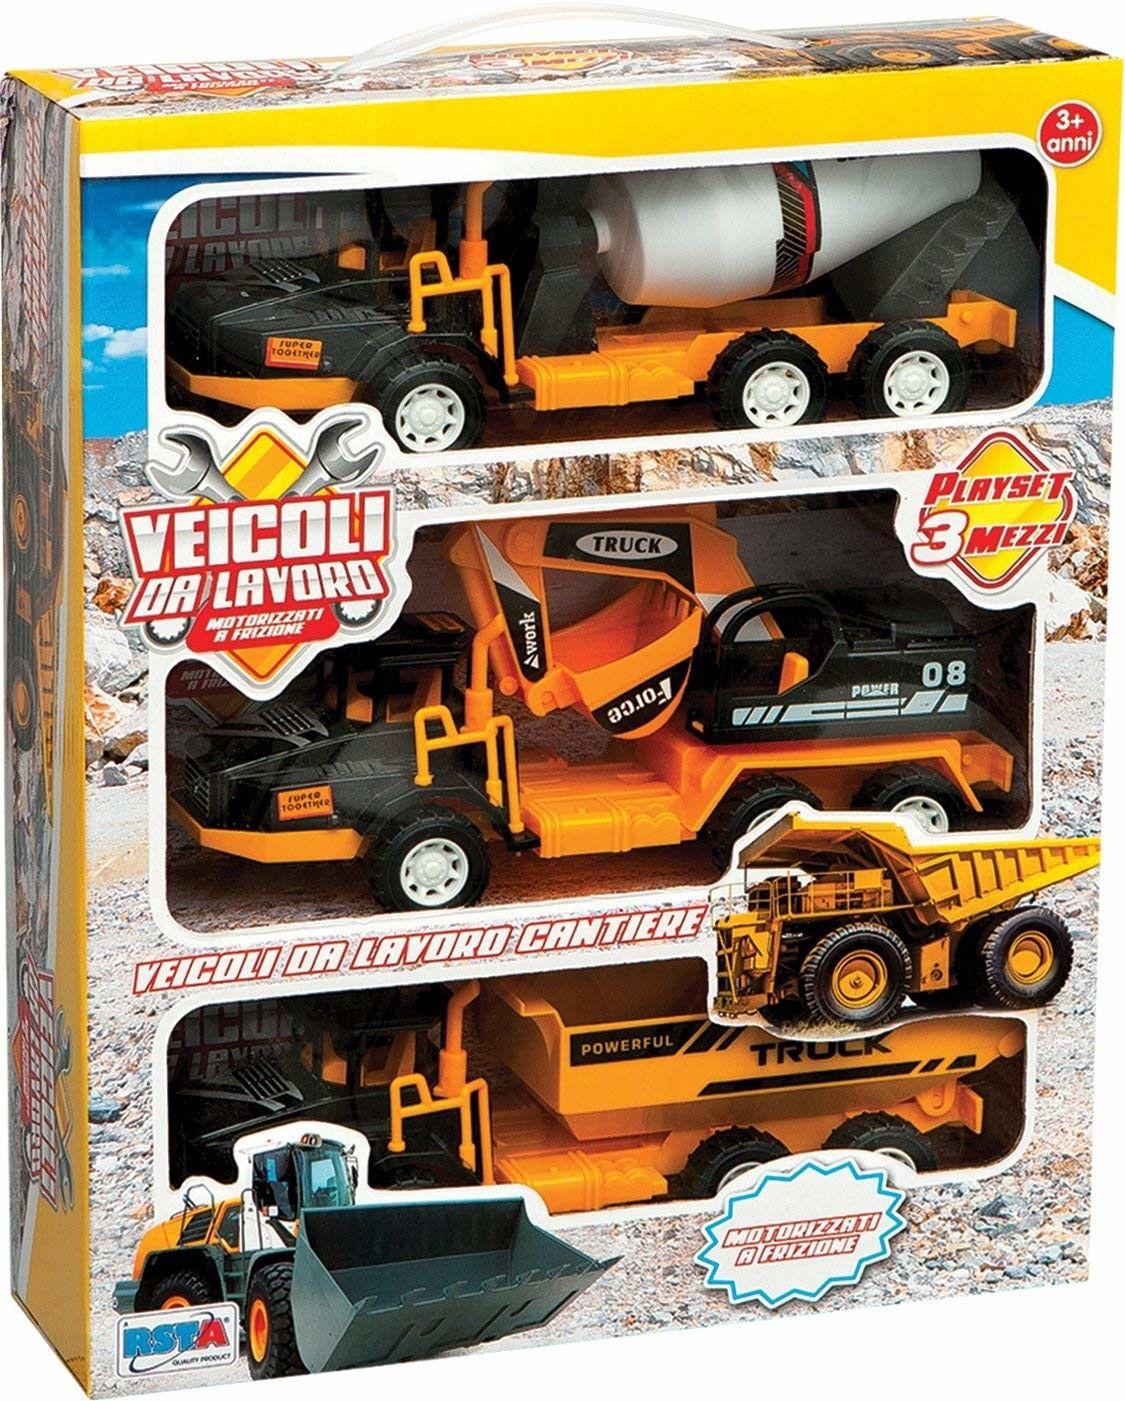 Italian Soul- RST 9681 Set 3 Veicoli da Lavoro FR, X08-ST-9681